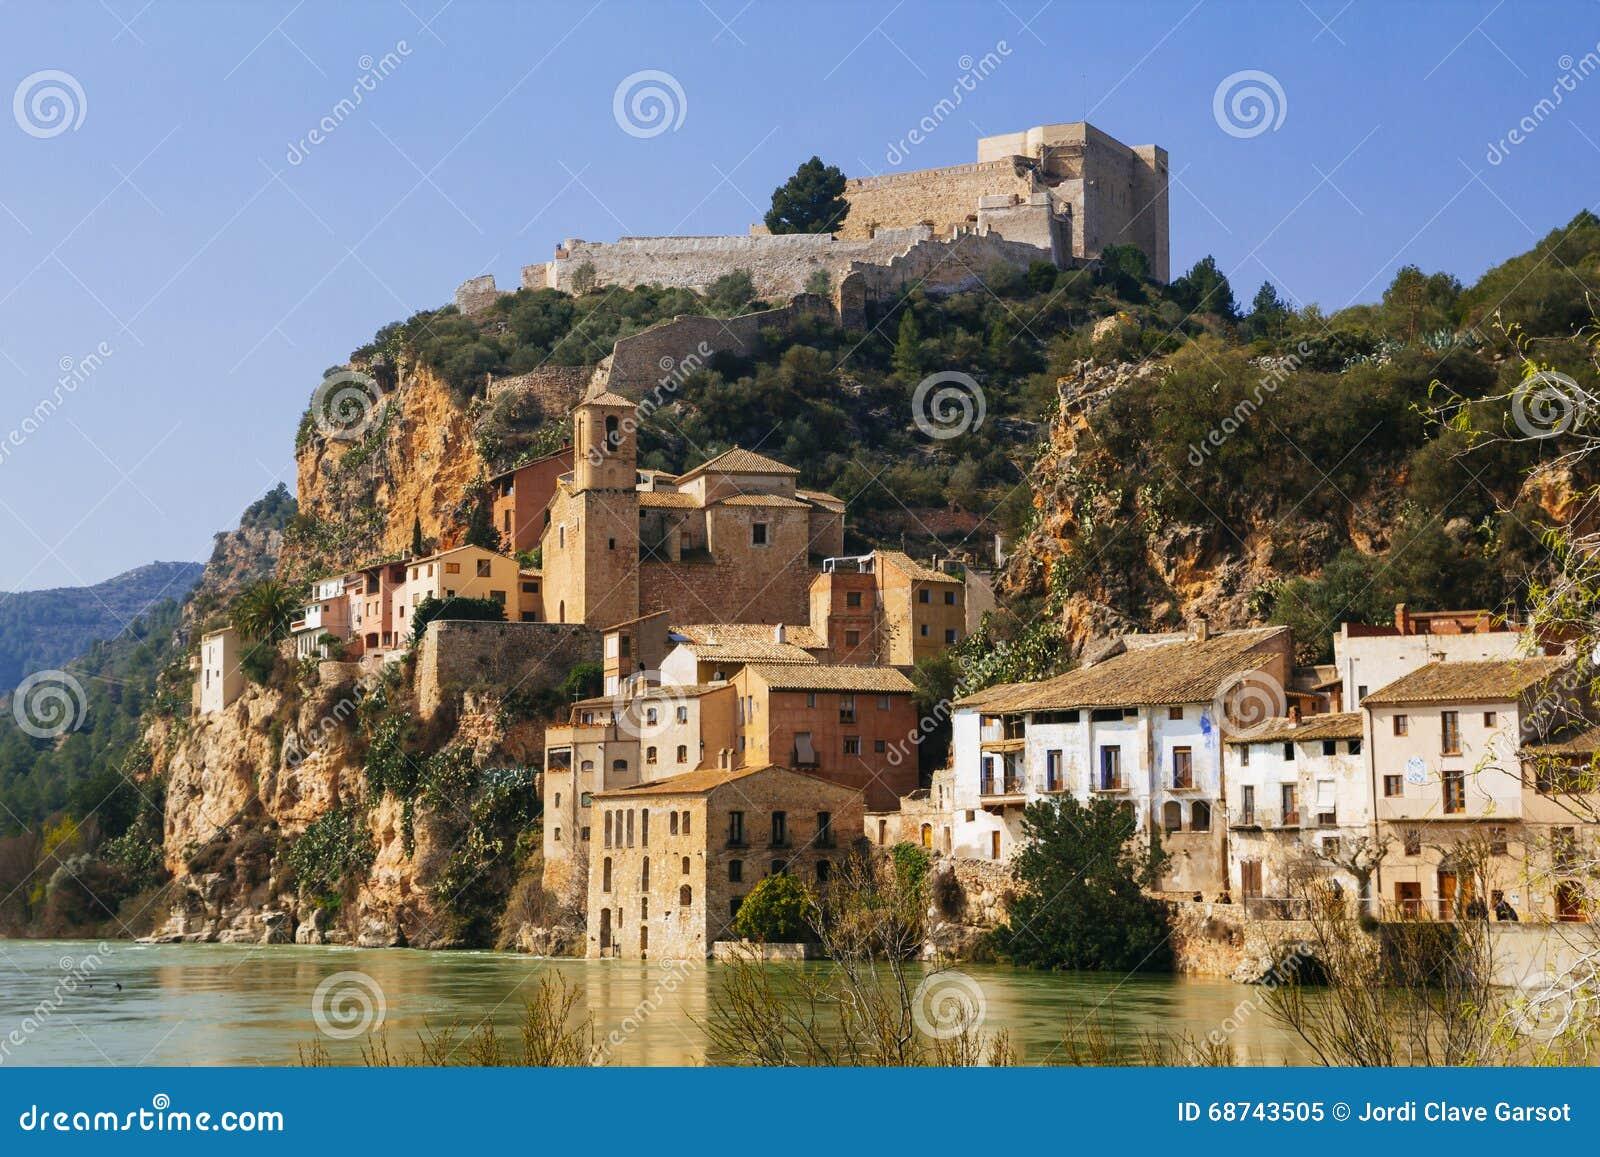 Miravet Village Catalunya Spain Old Little Located Middle Terres De L Ebre Beautiful Landscape